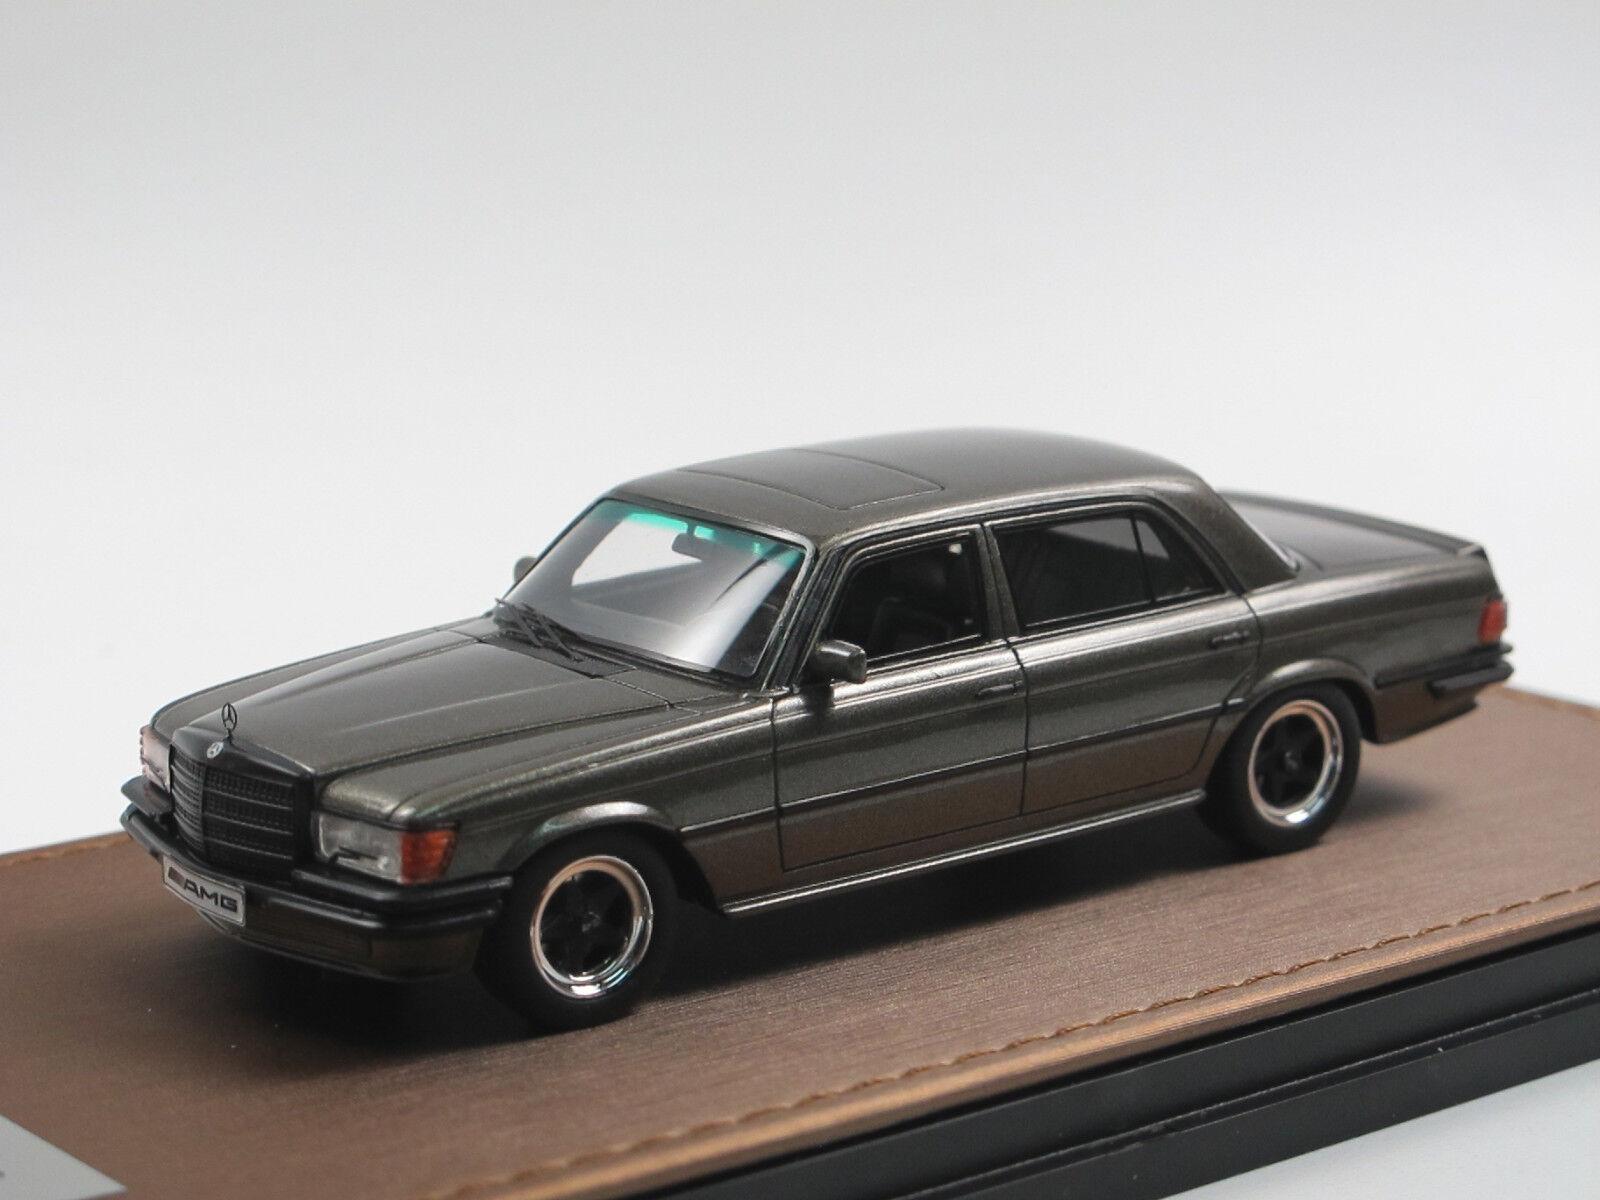 GLM 1978 AMG Mercedes-Benz 450 SEL 6.9 w116 Olive 1 43 limited edition